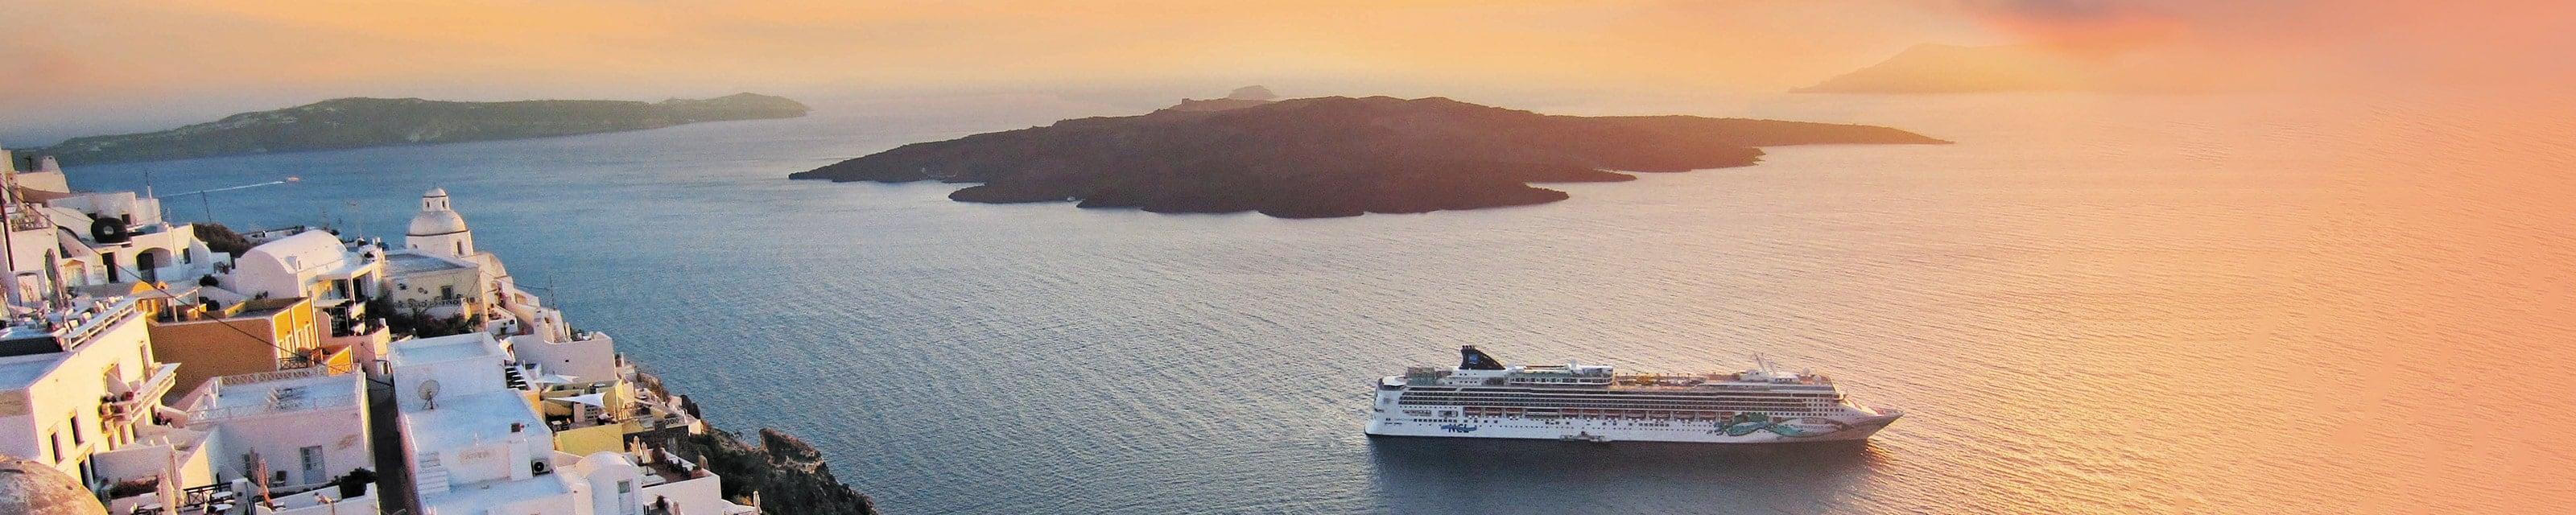 Norwegian's Free at Sea - 20 years of Freestyle Cruising